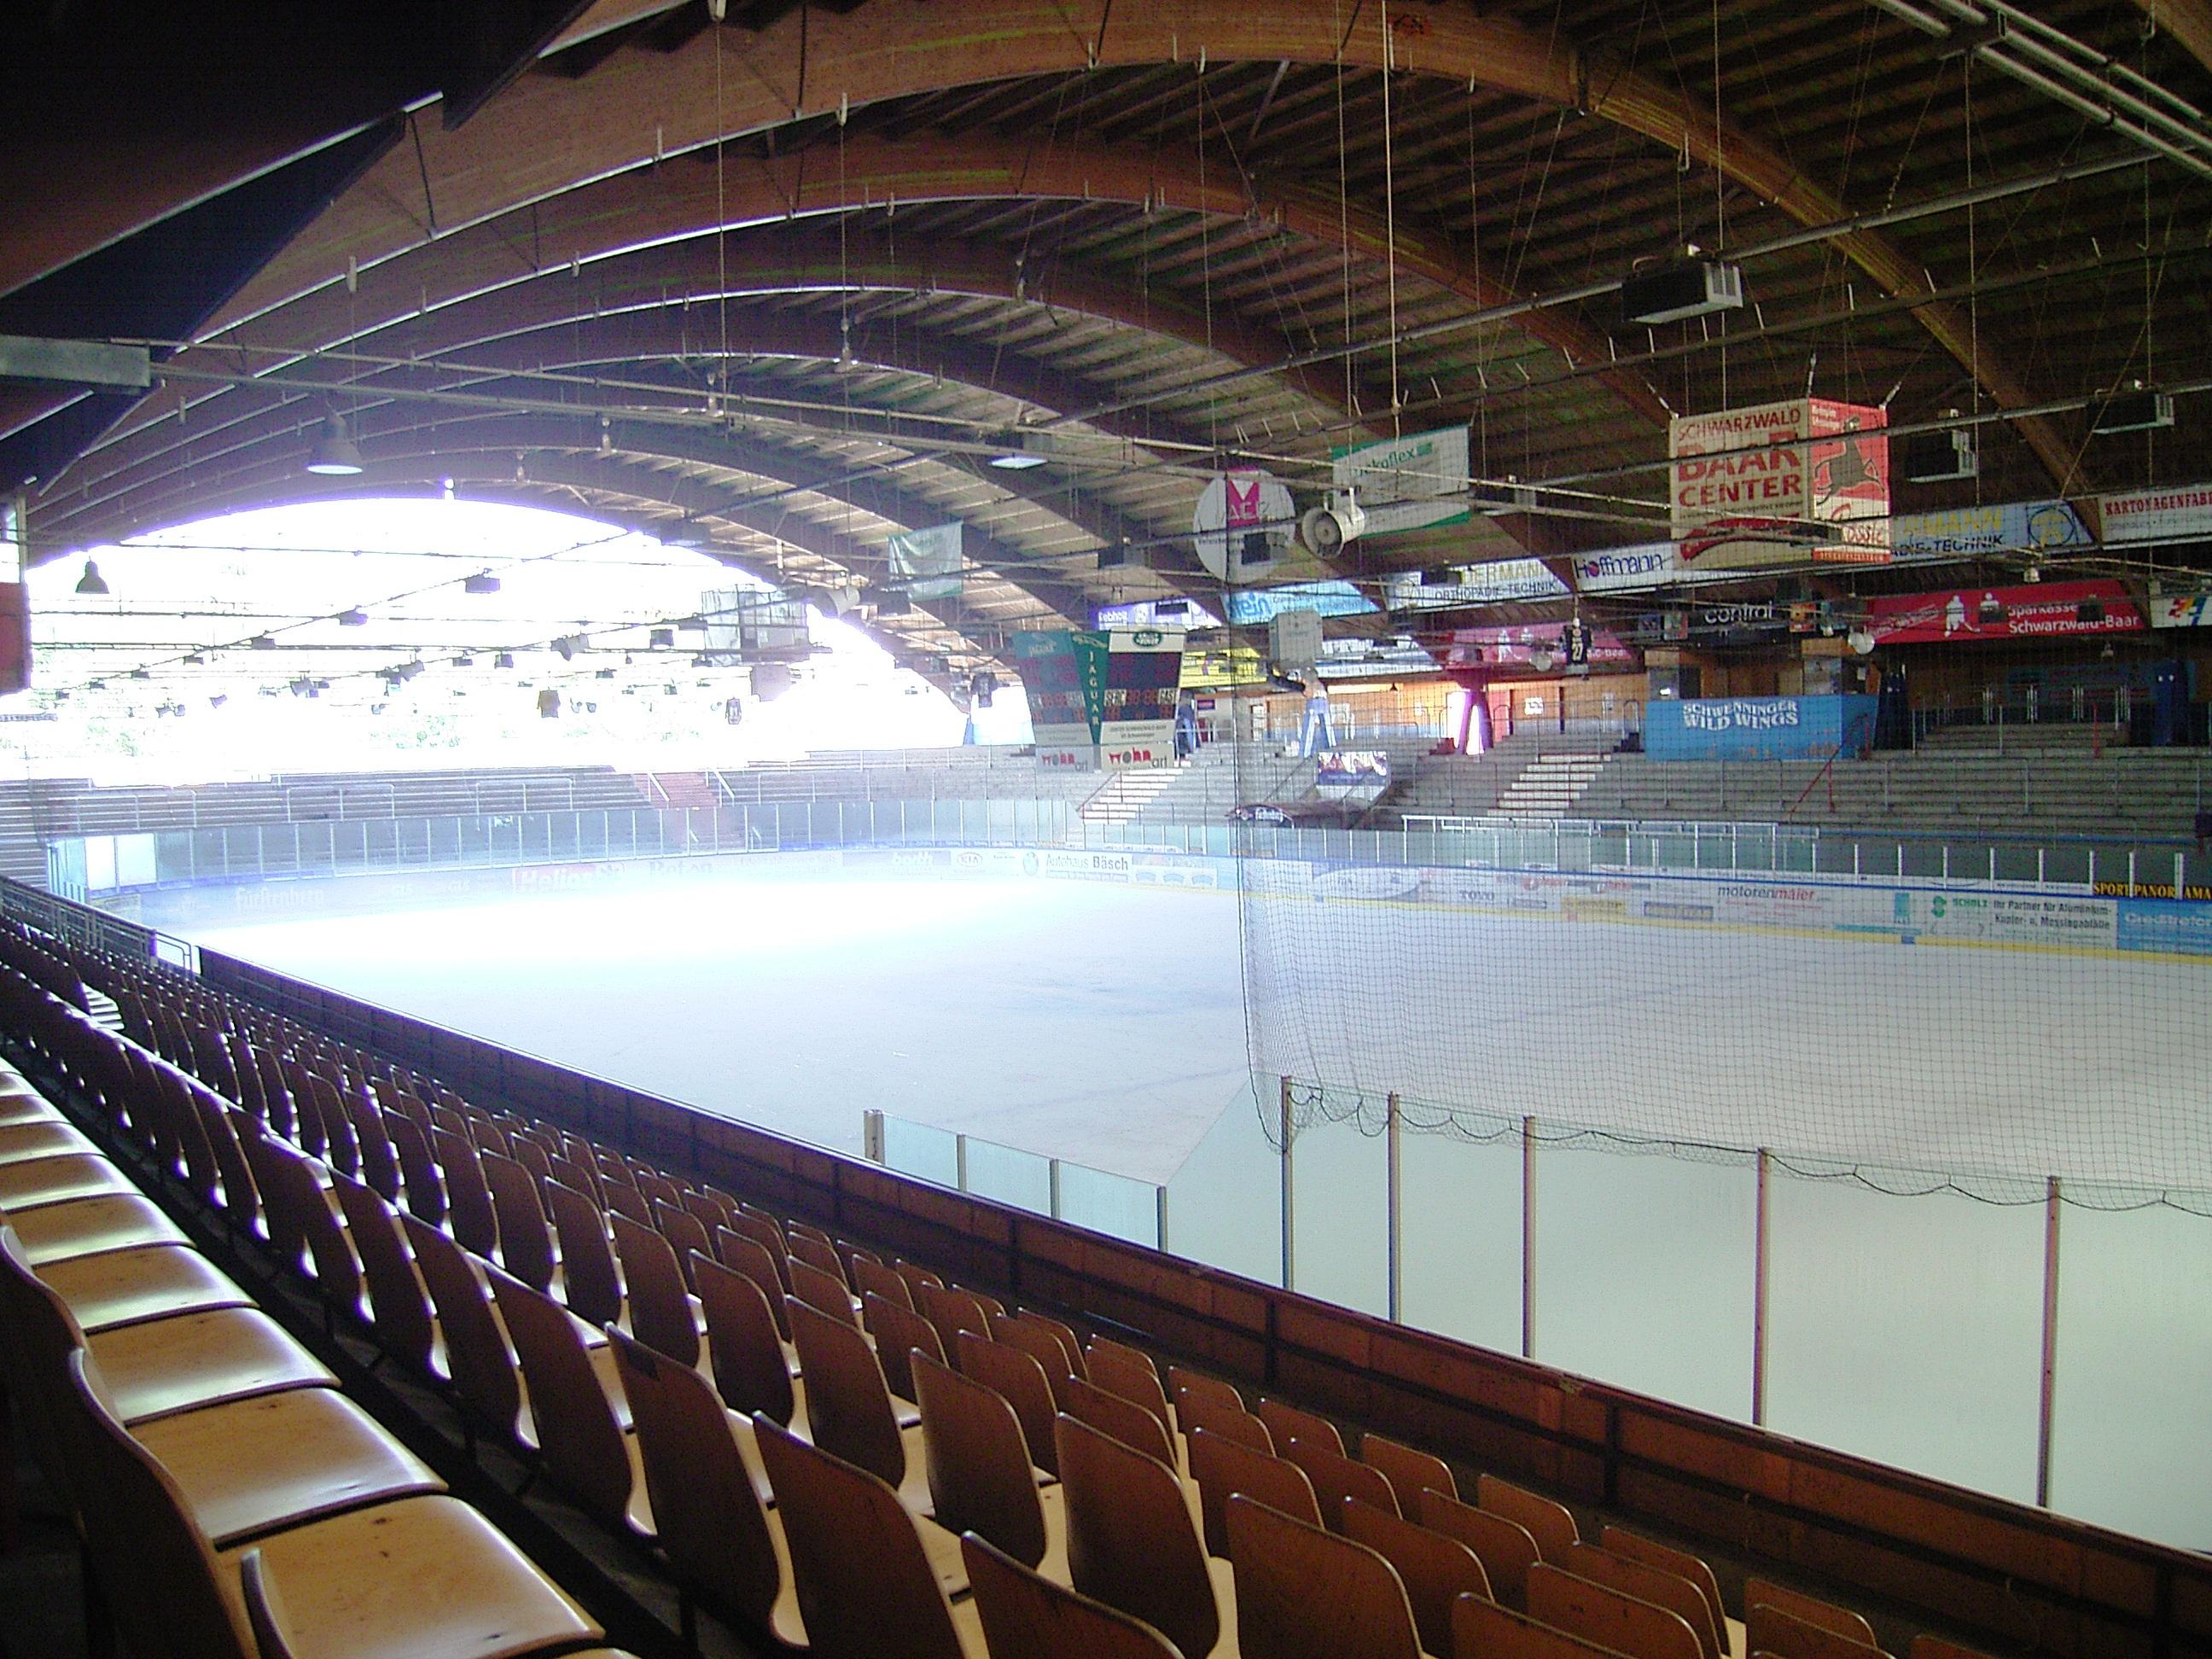 Eisstadion Pferdeturm